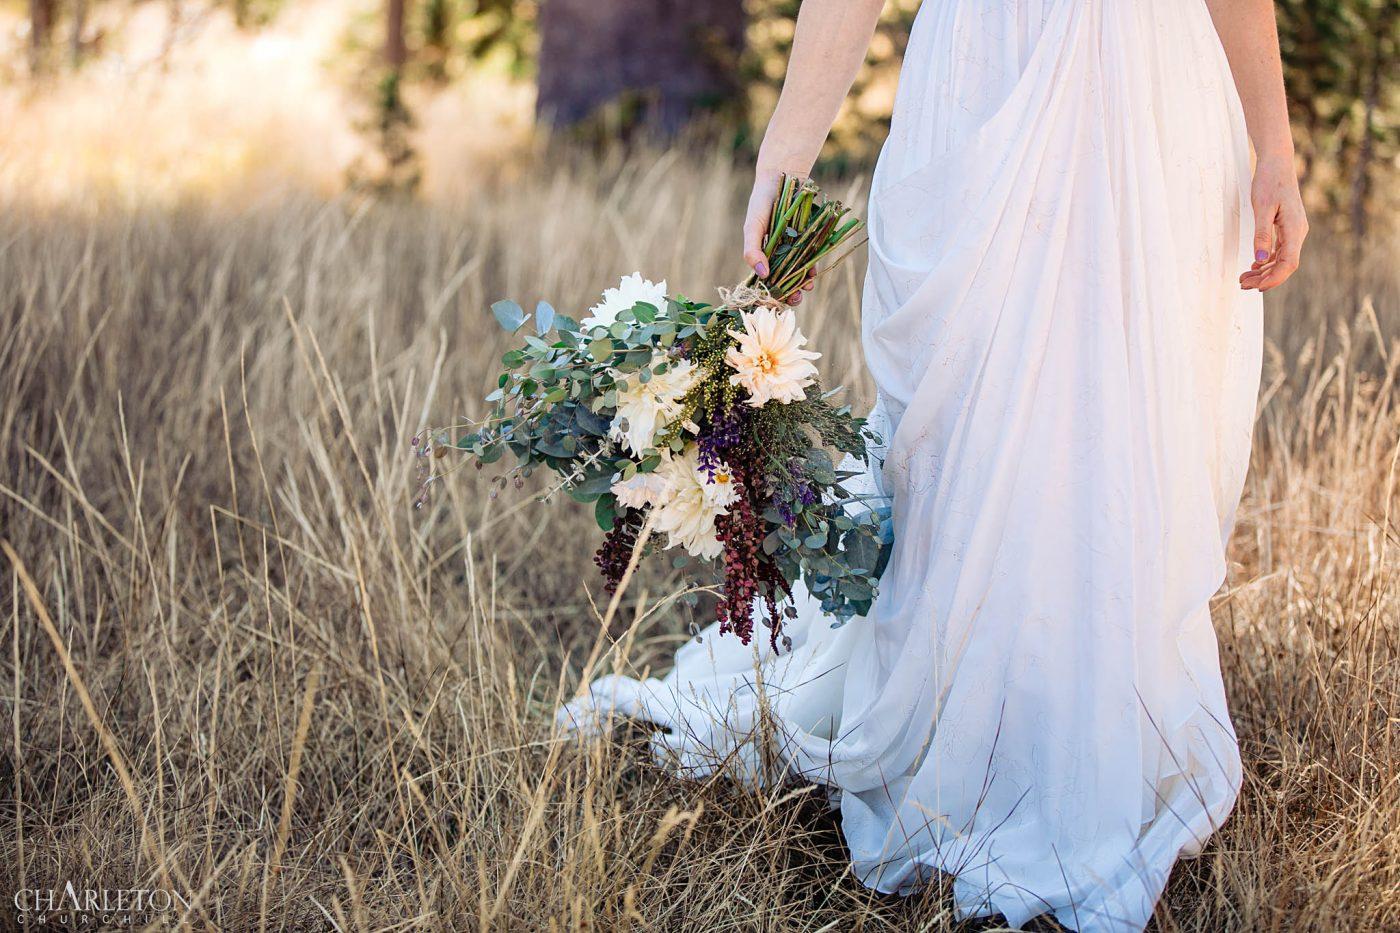 kirkwood ca. wedding bouquet in the field summer